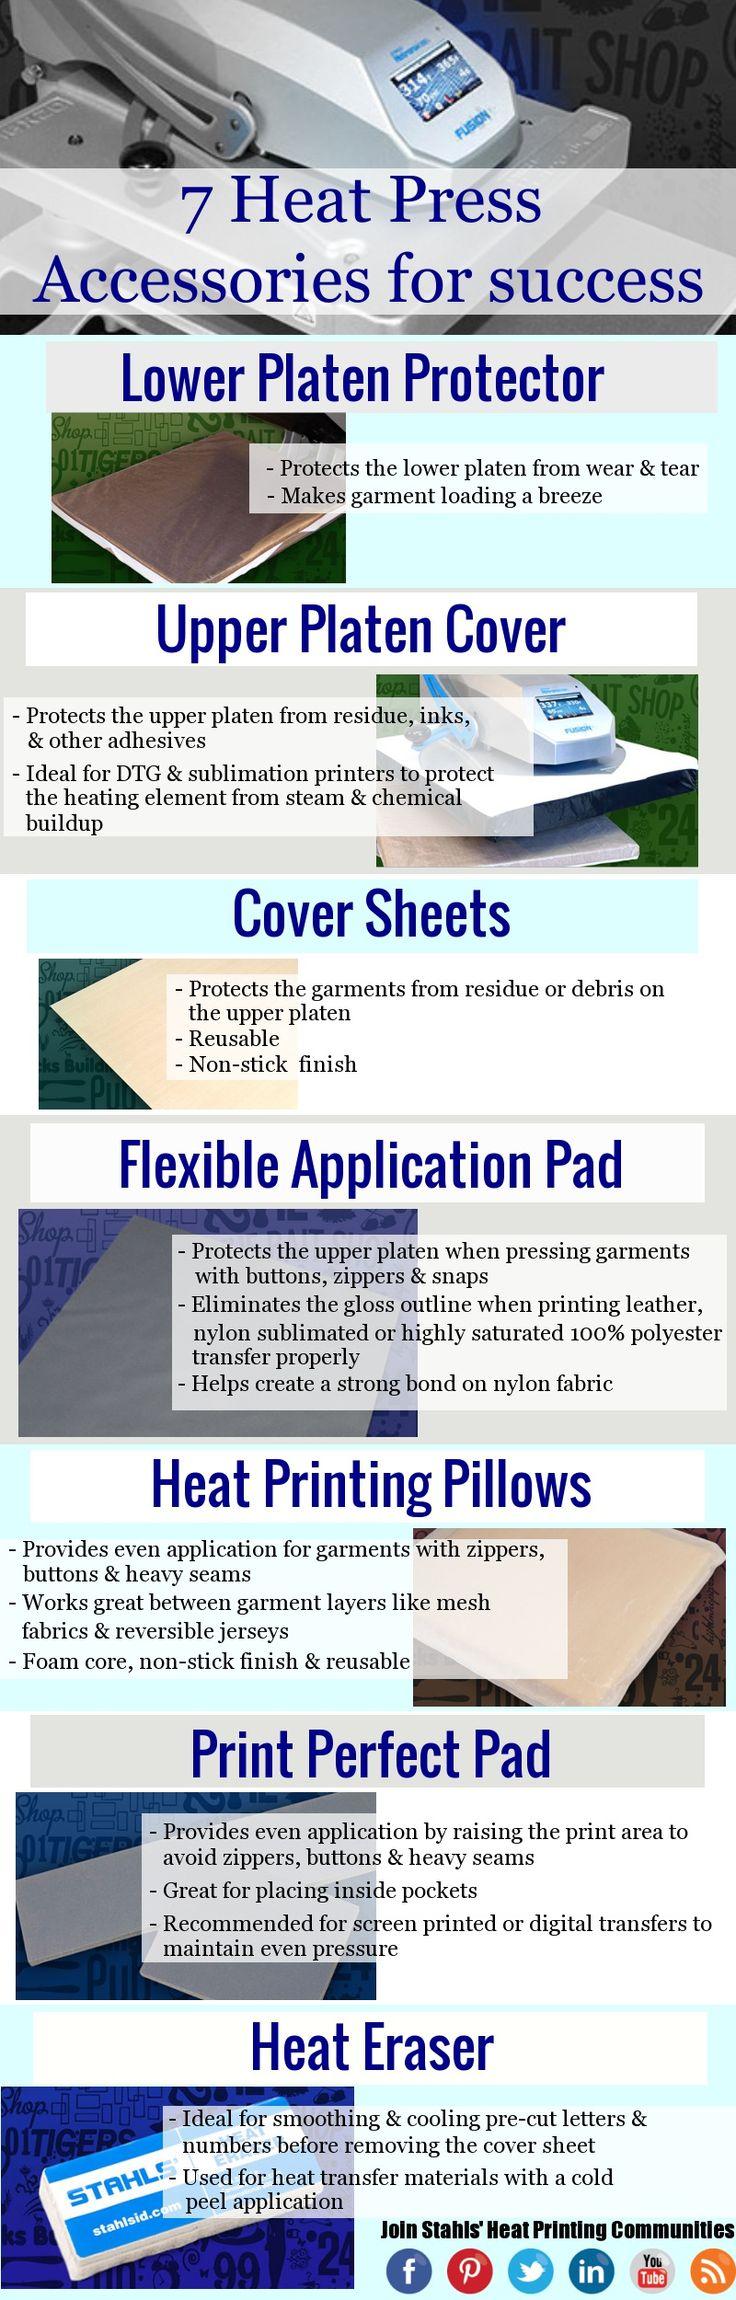 7 #HeatPress Accessories for Heat Printing Success. Stahls.com